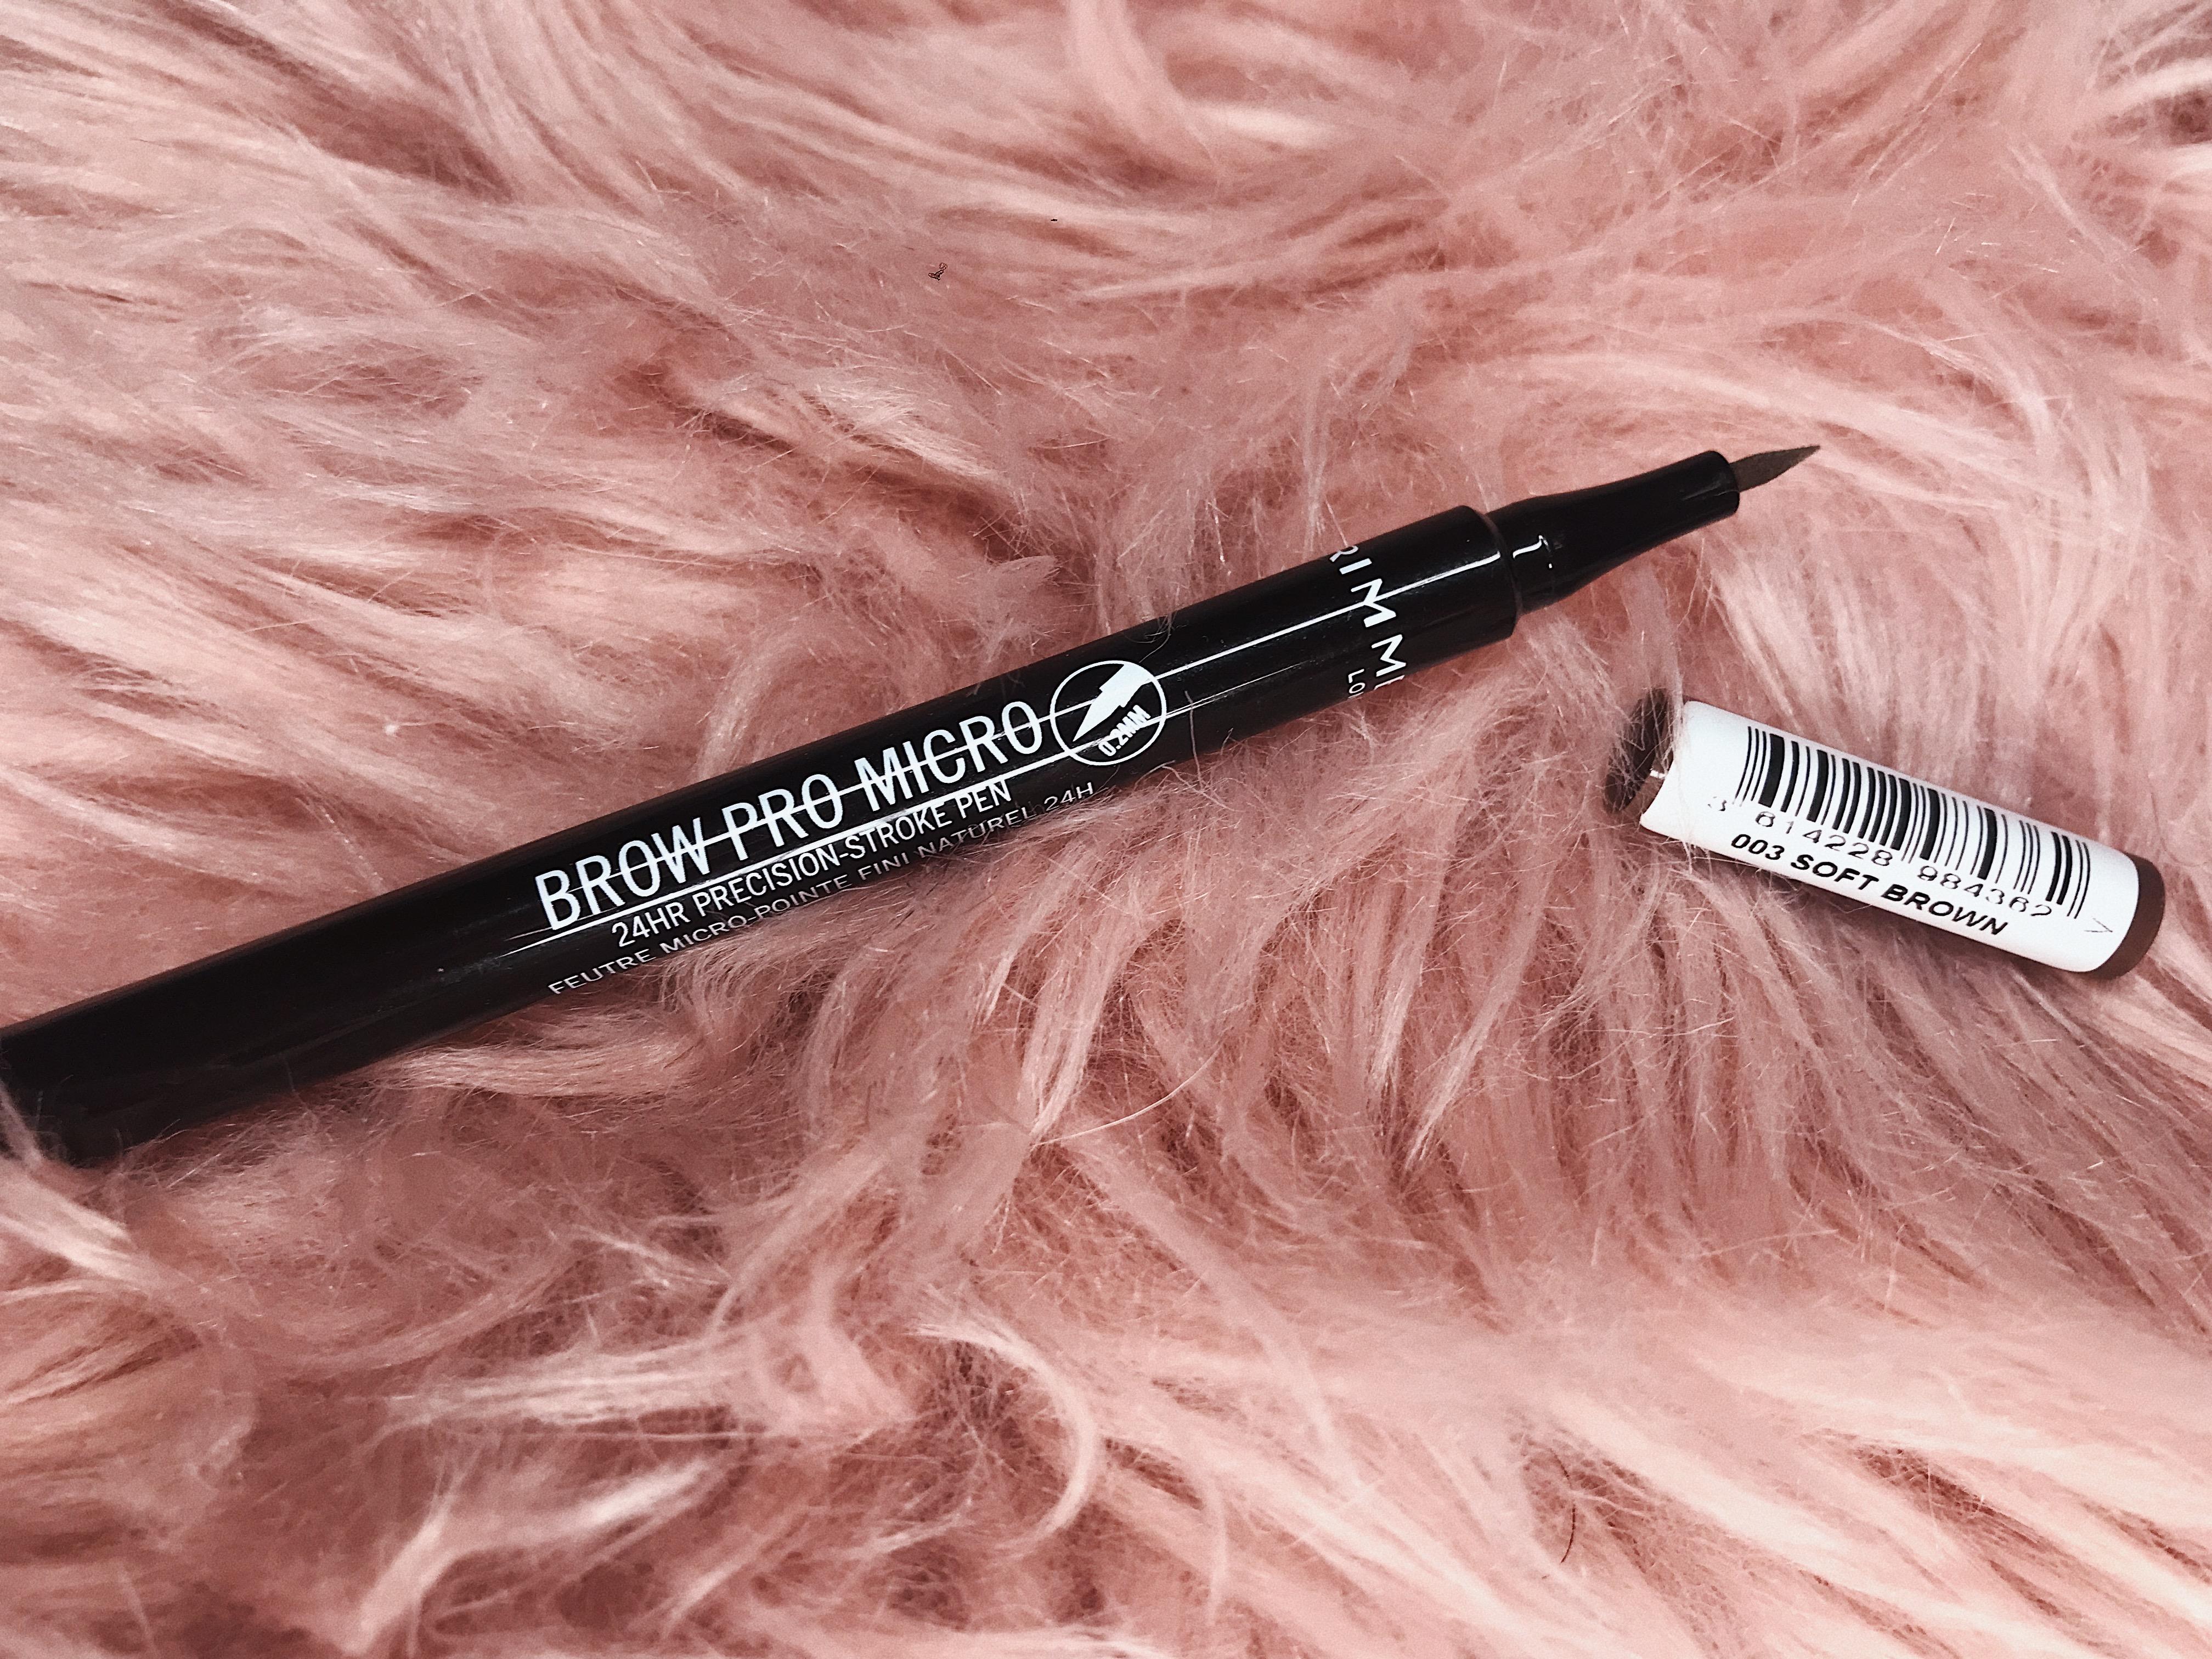 rimmel brow pro micro pen rossmann promocja